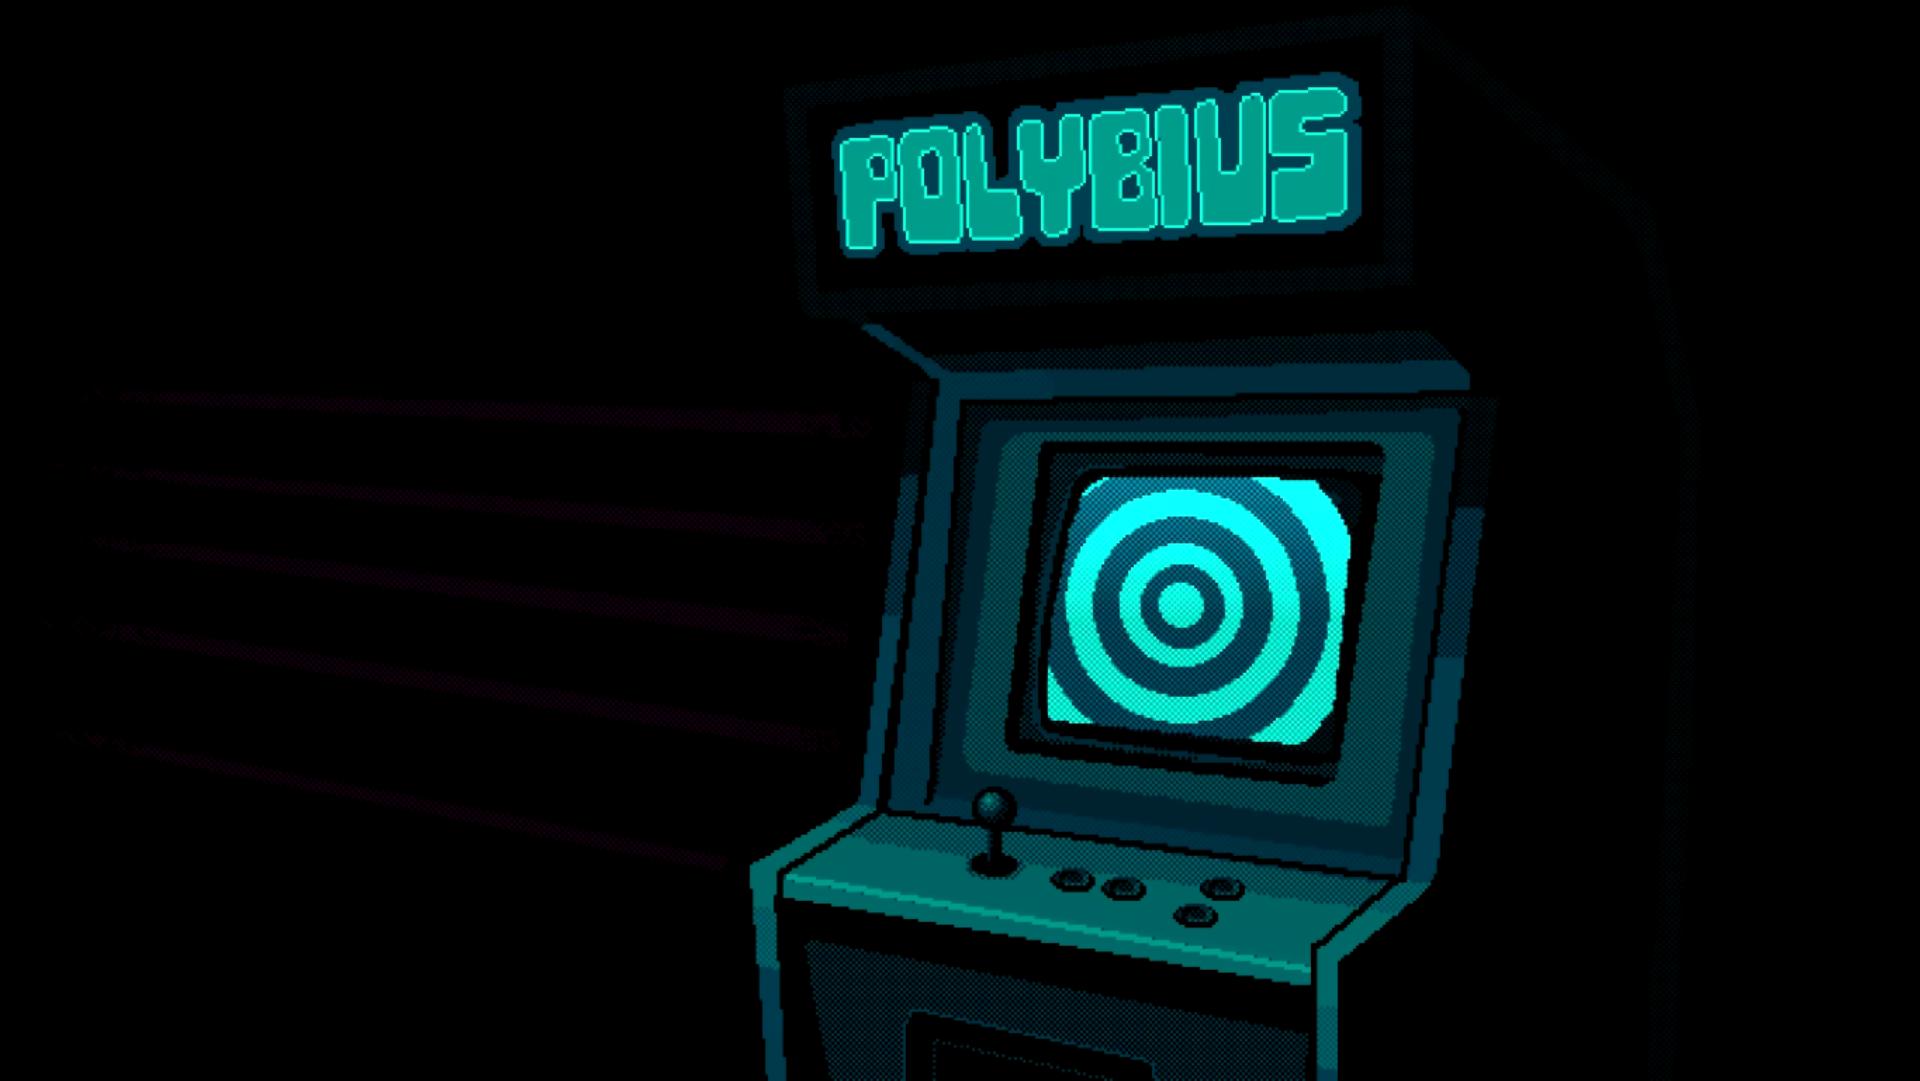 General 1920x1081 synthwave polybius retro games 8-bit arcade  creepy pixel art pixels Ahoy teal